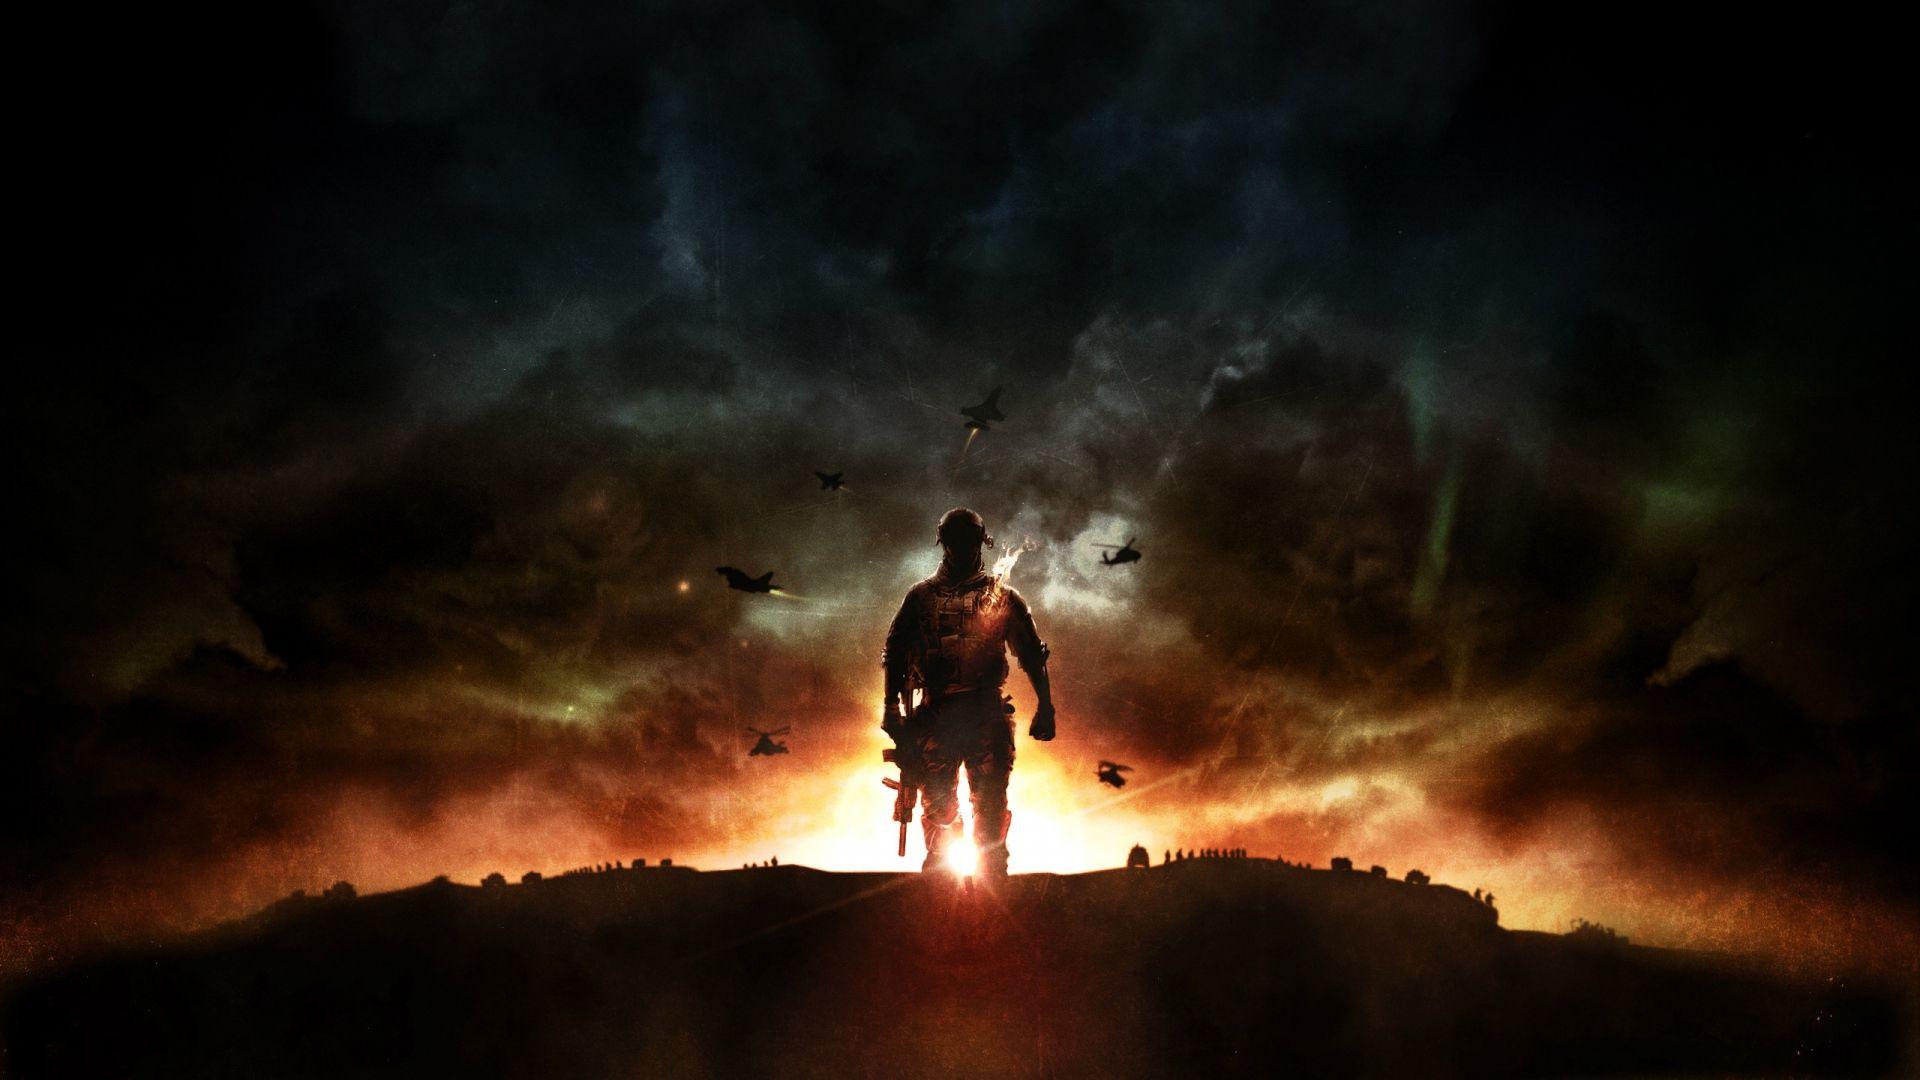 1920x1080 Wallpaper Battlefield 4 Game Explosion Ea Digital Illusions Ce 2560x1440 Wallpaper Portadas Para Youtube 2560x1440 Fotos De 2048x1152